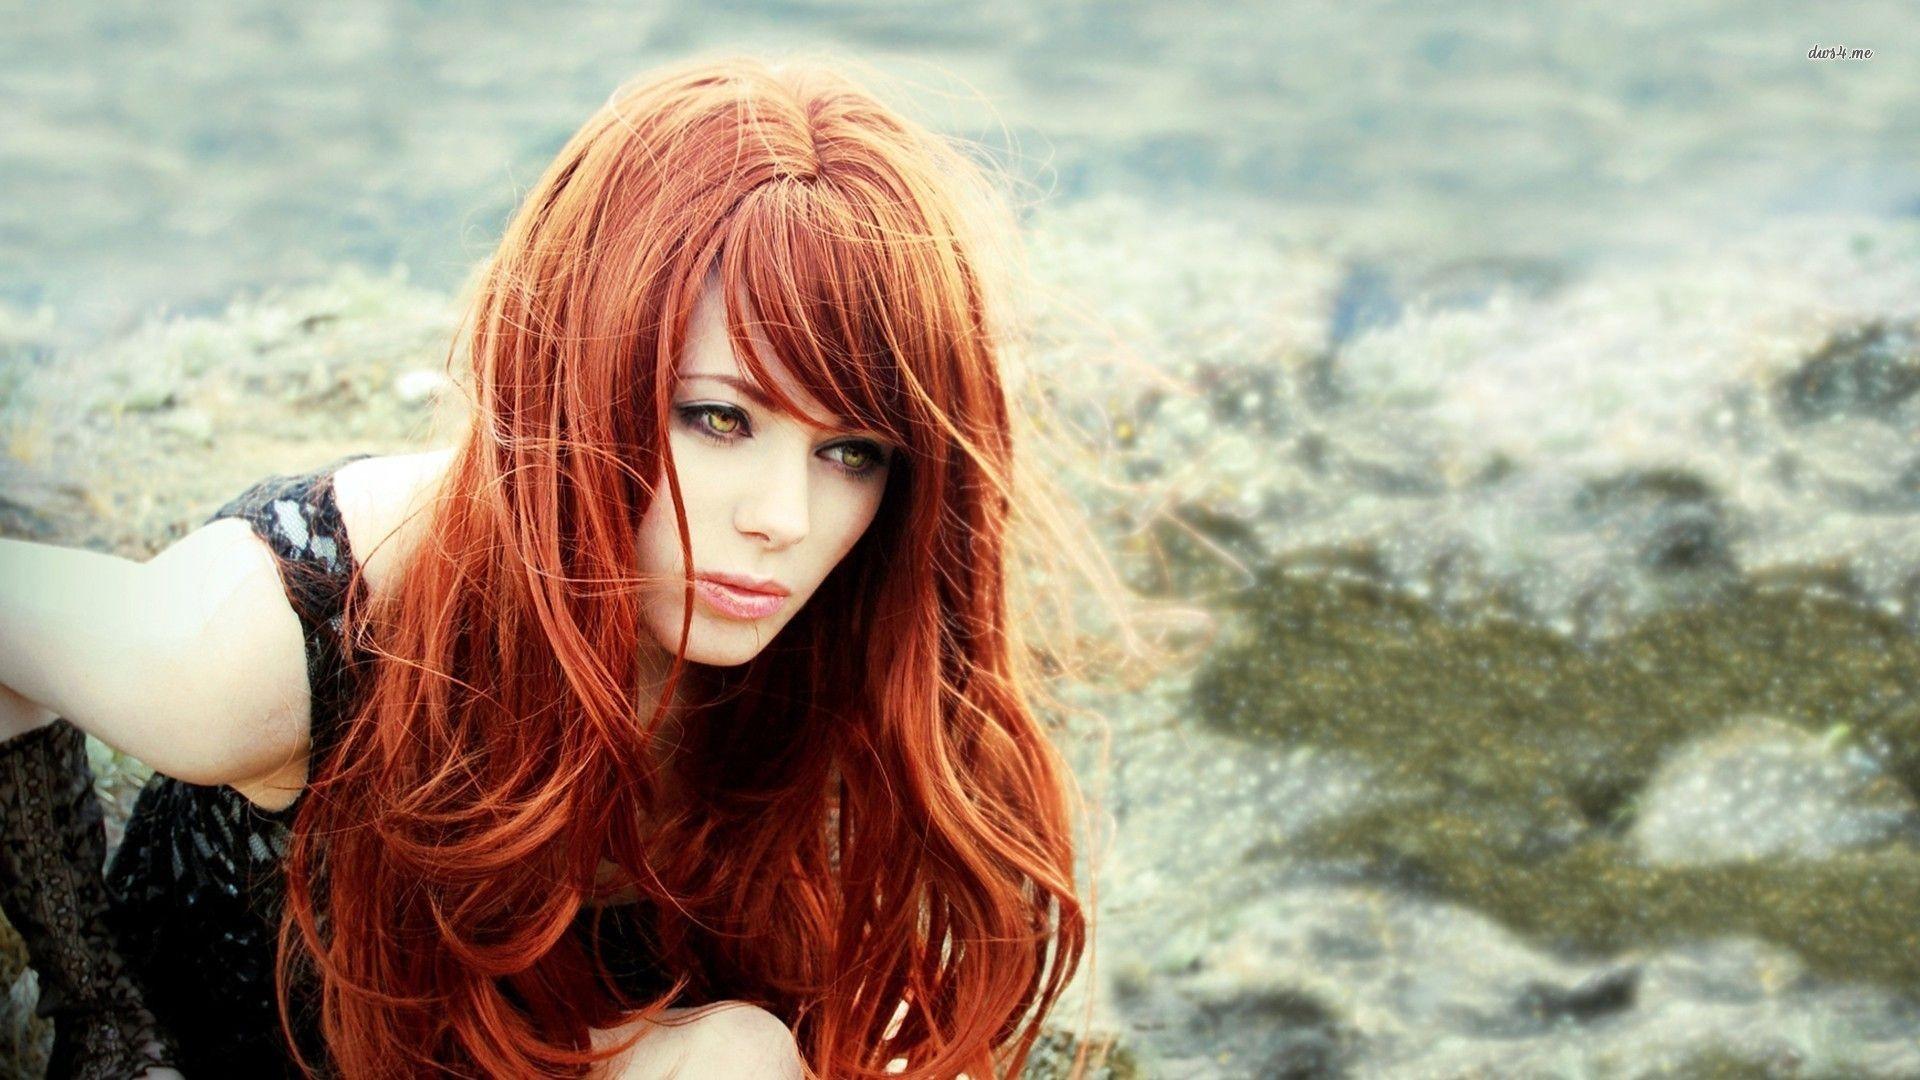 Wallpaper Redhead